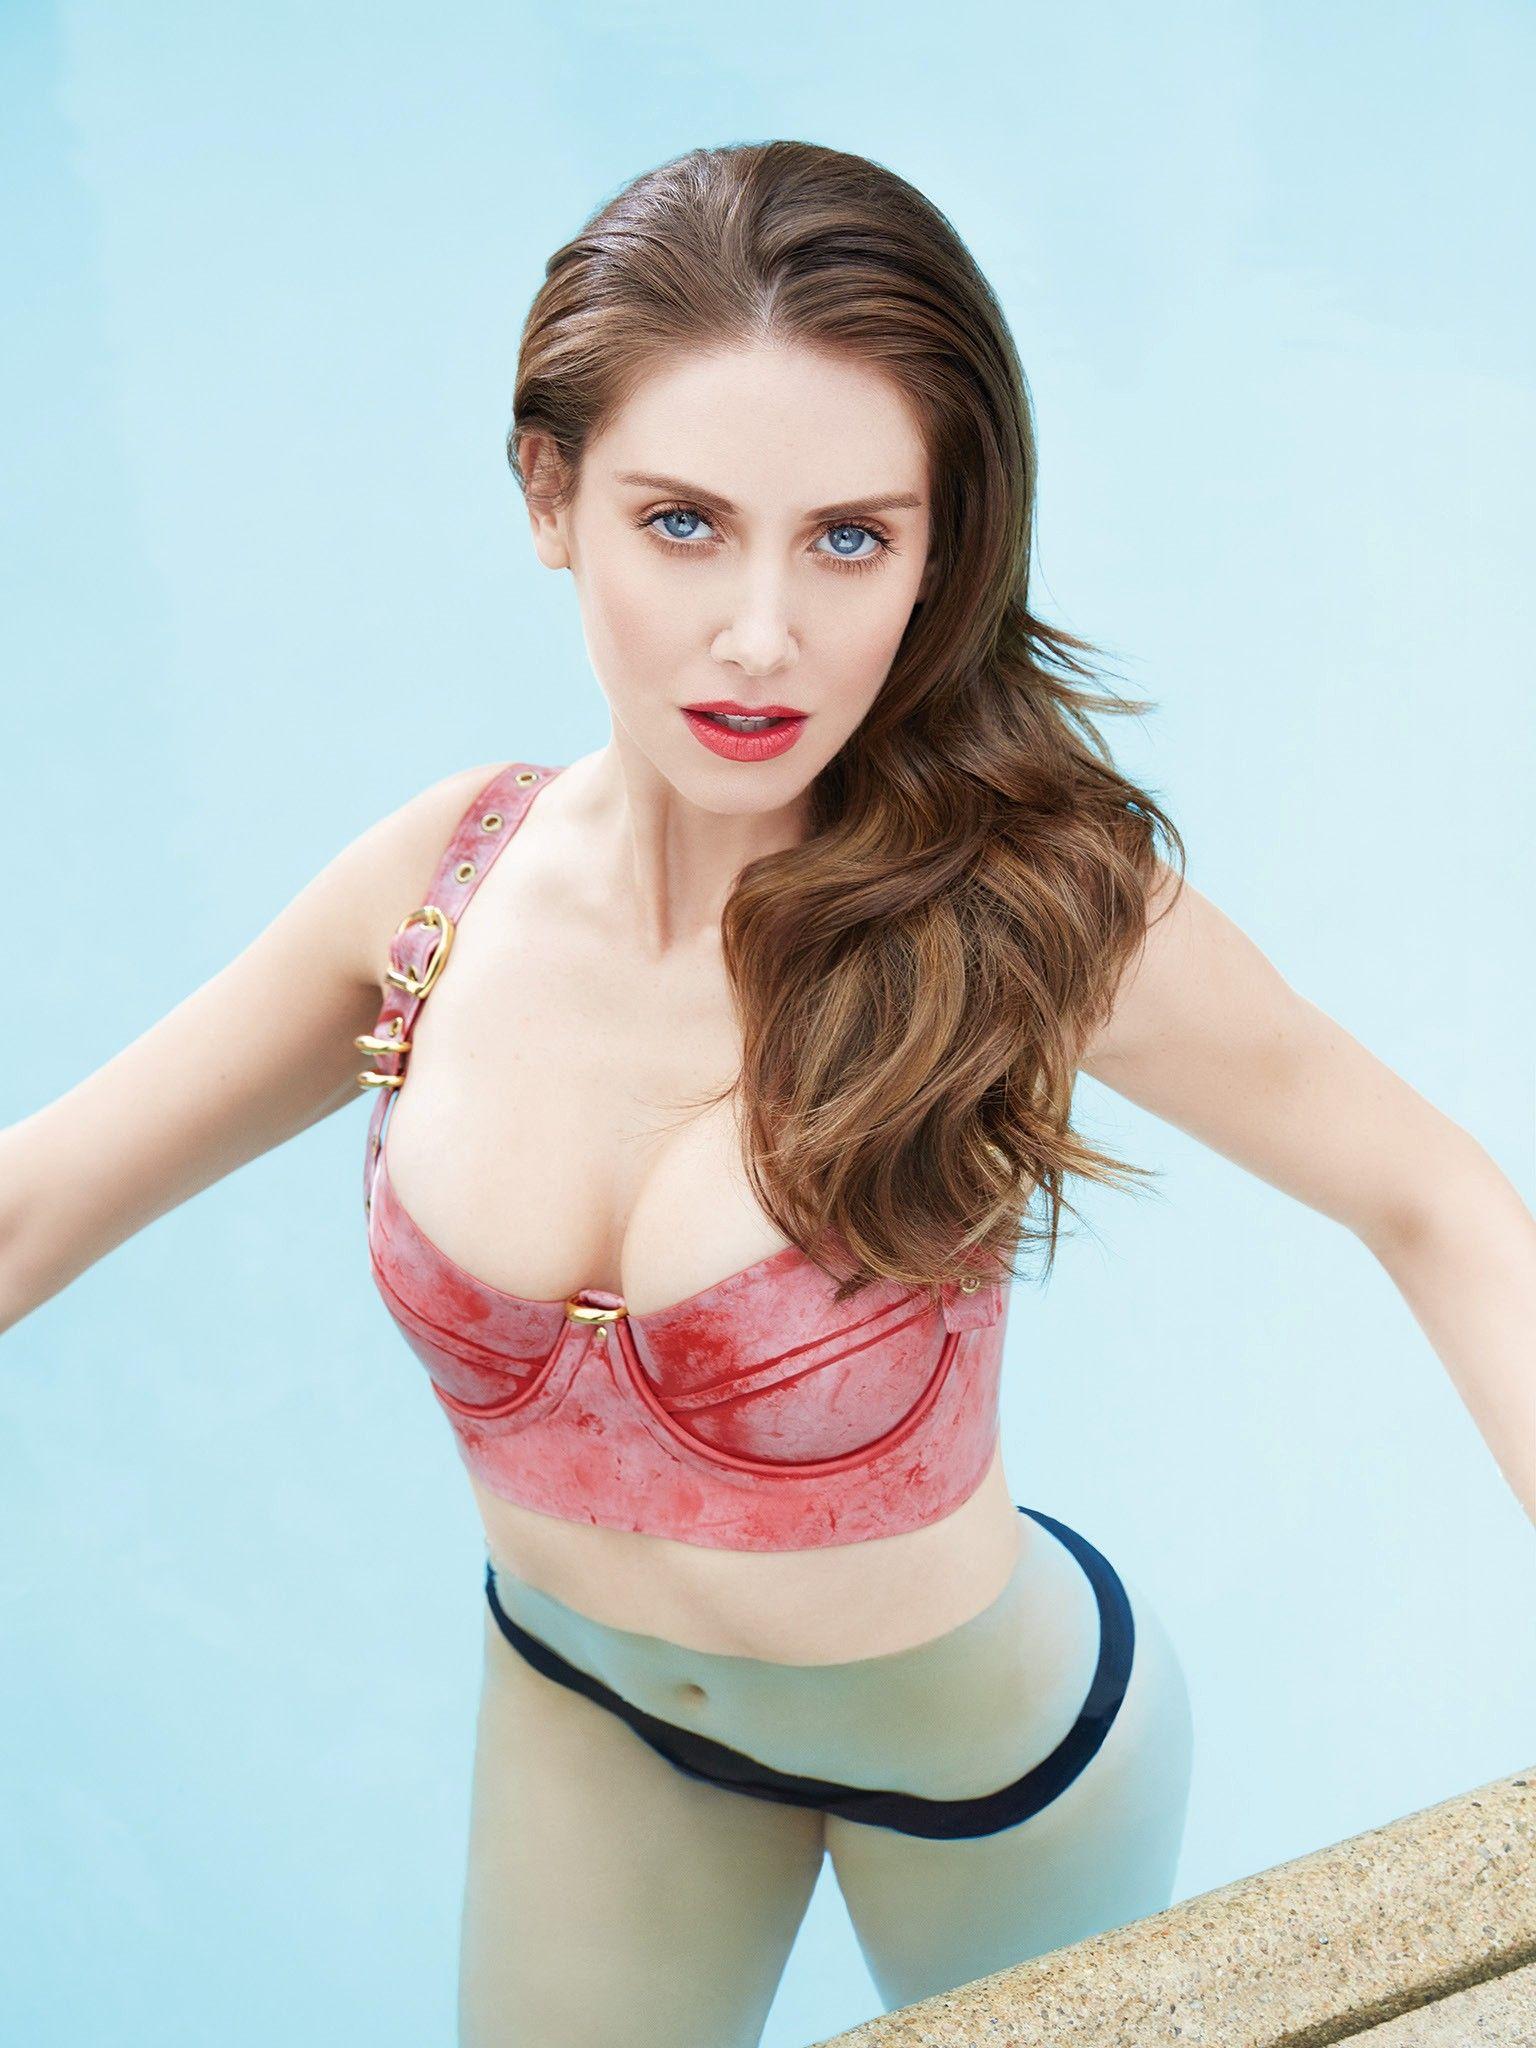 Sexy Alison Brie naked (13 photos), Sexy, Sideboobs, Boobs, bra 2006